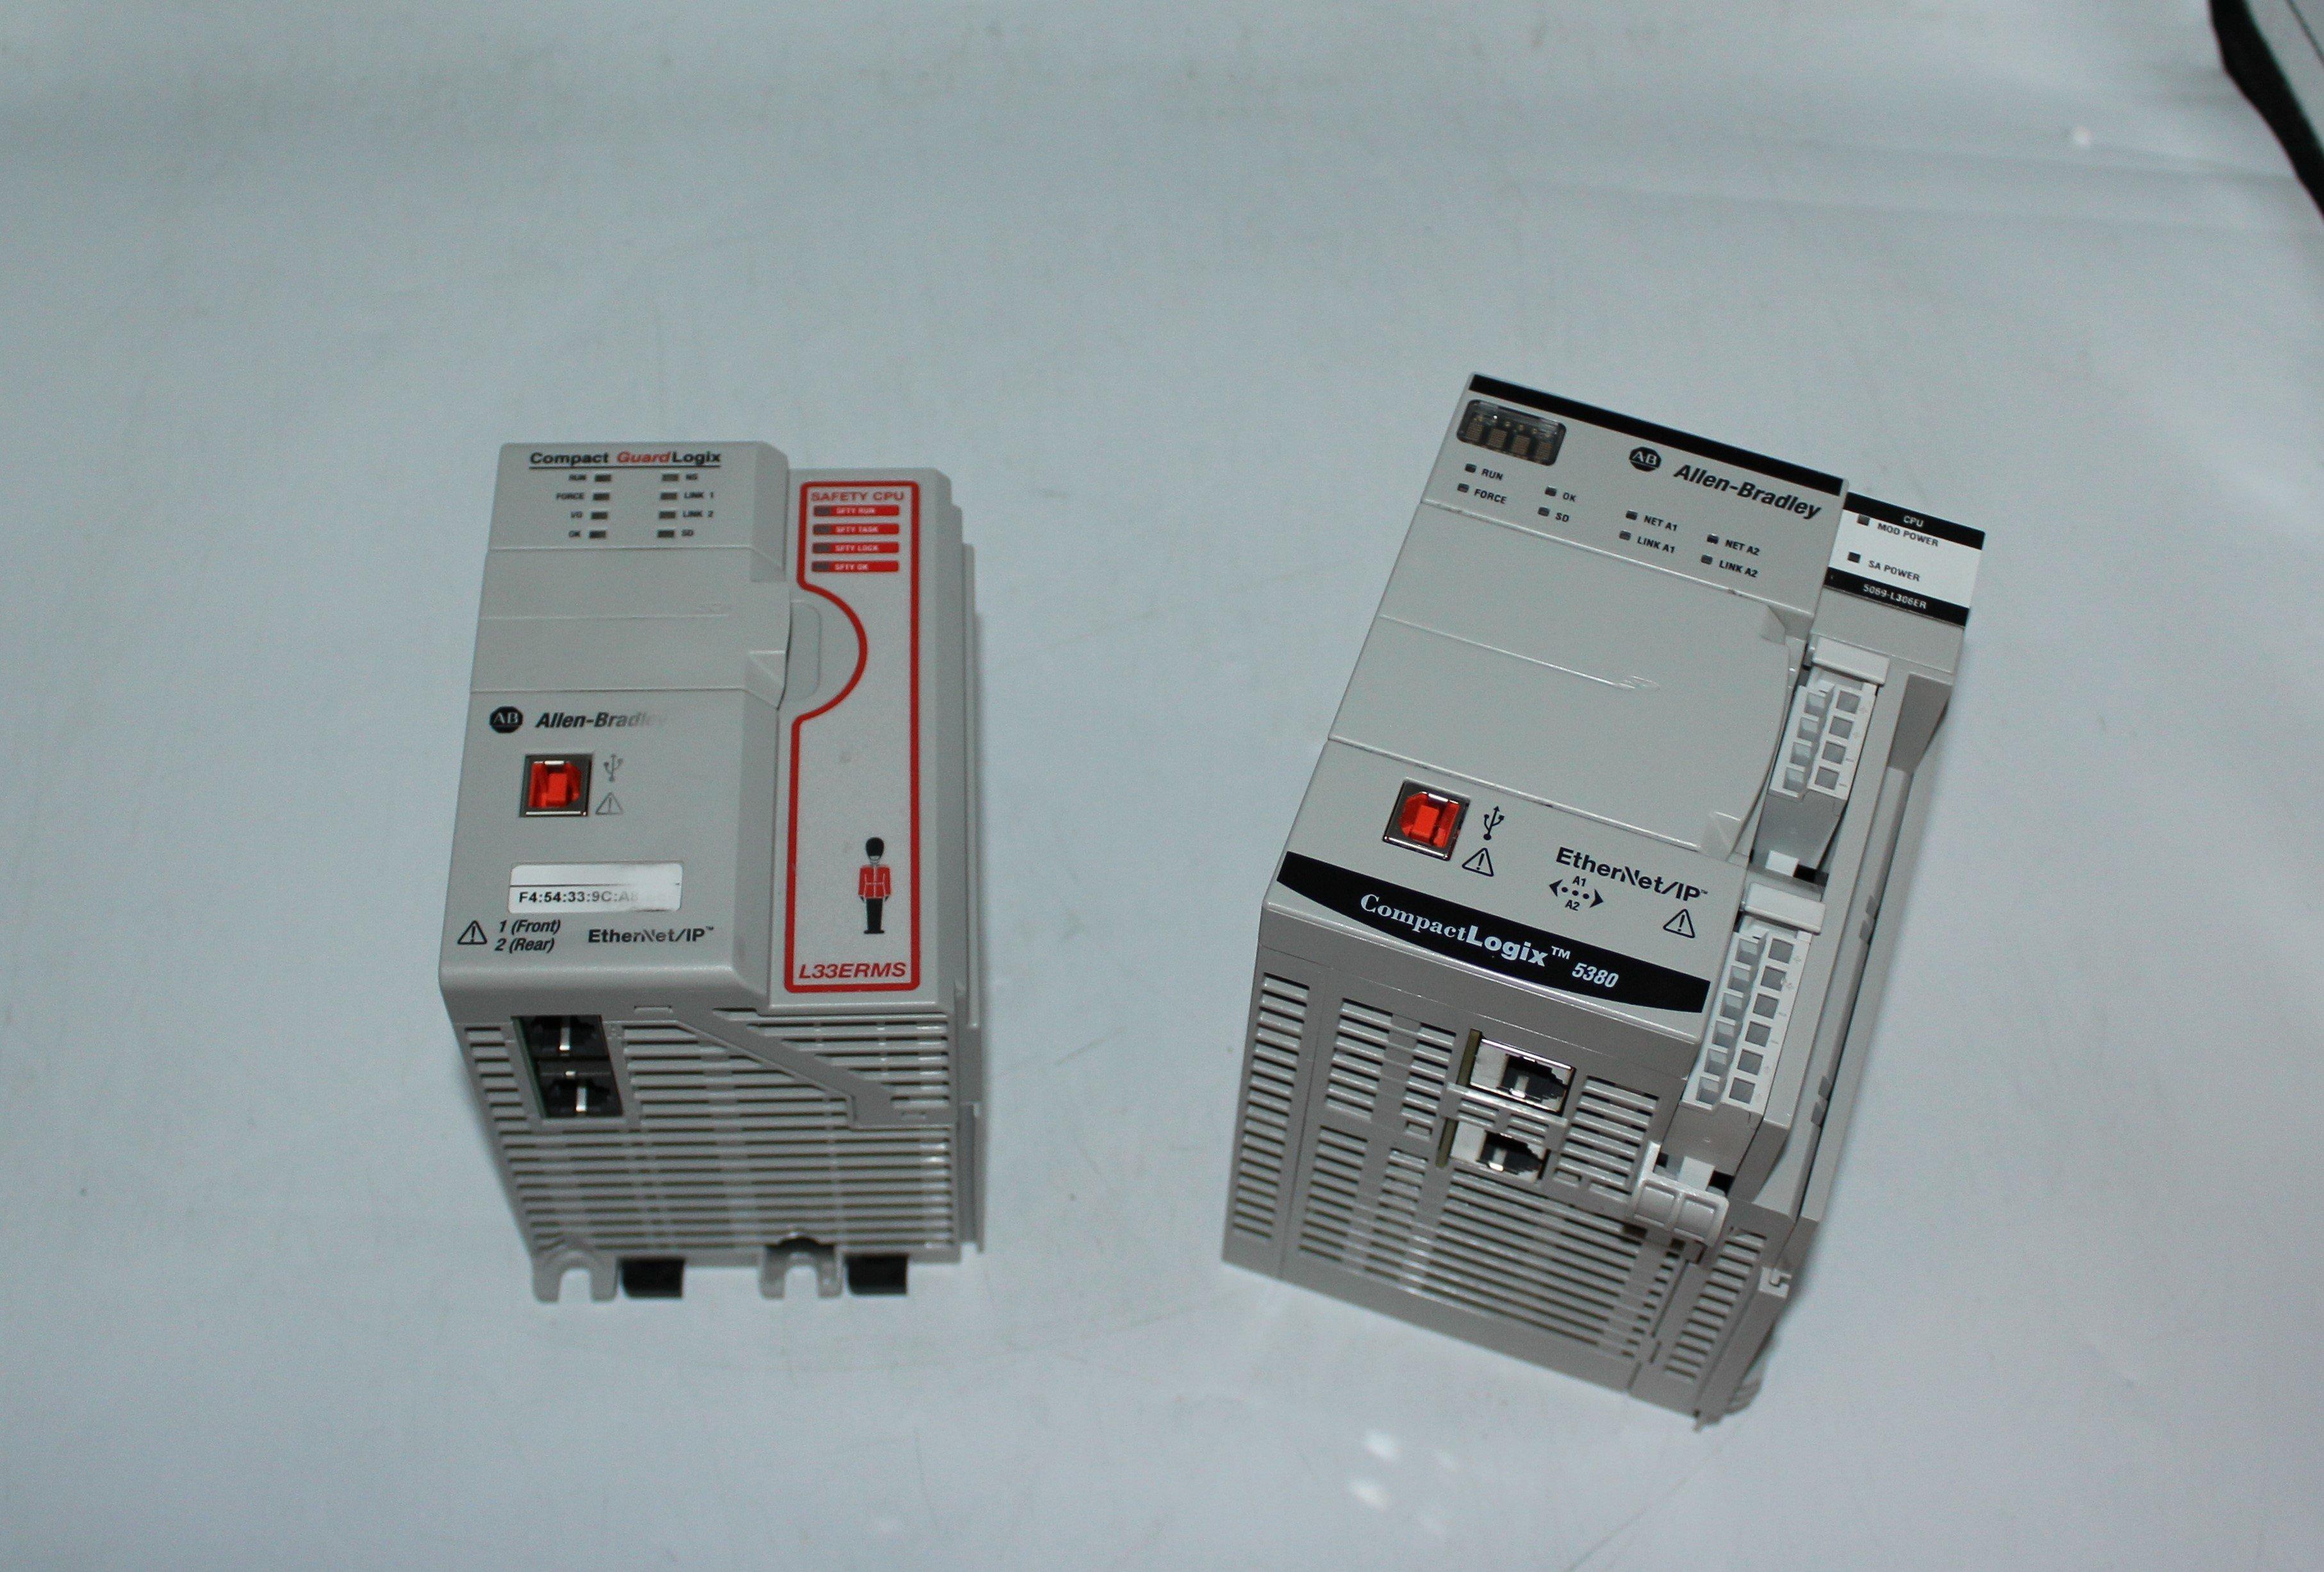 Hardware Comparison: CompactLogix 1769 vs. 5069 Series